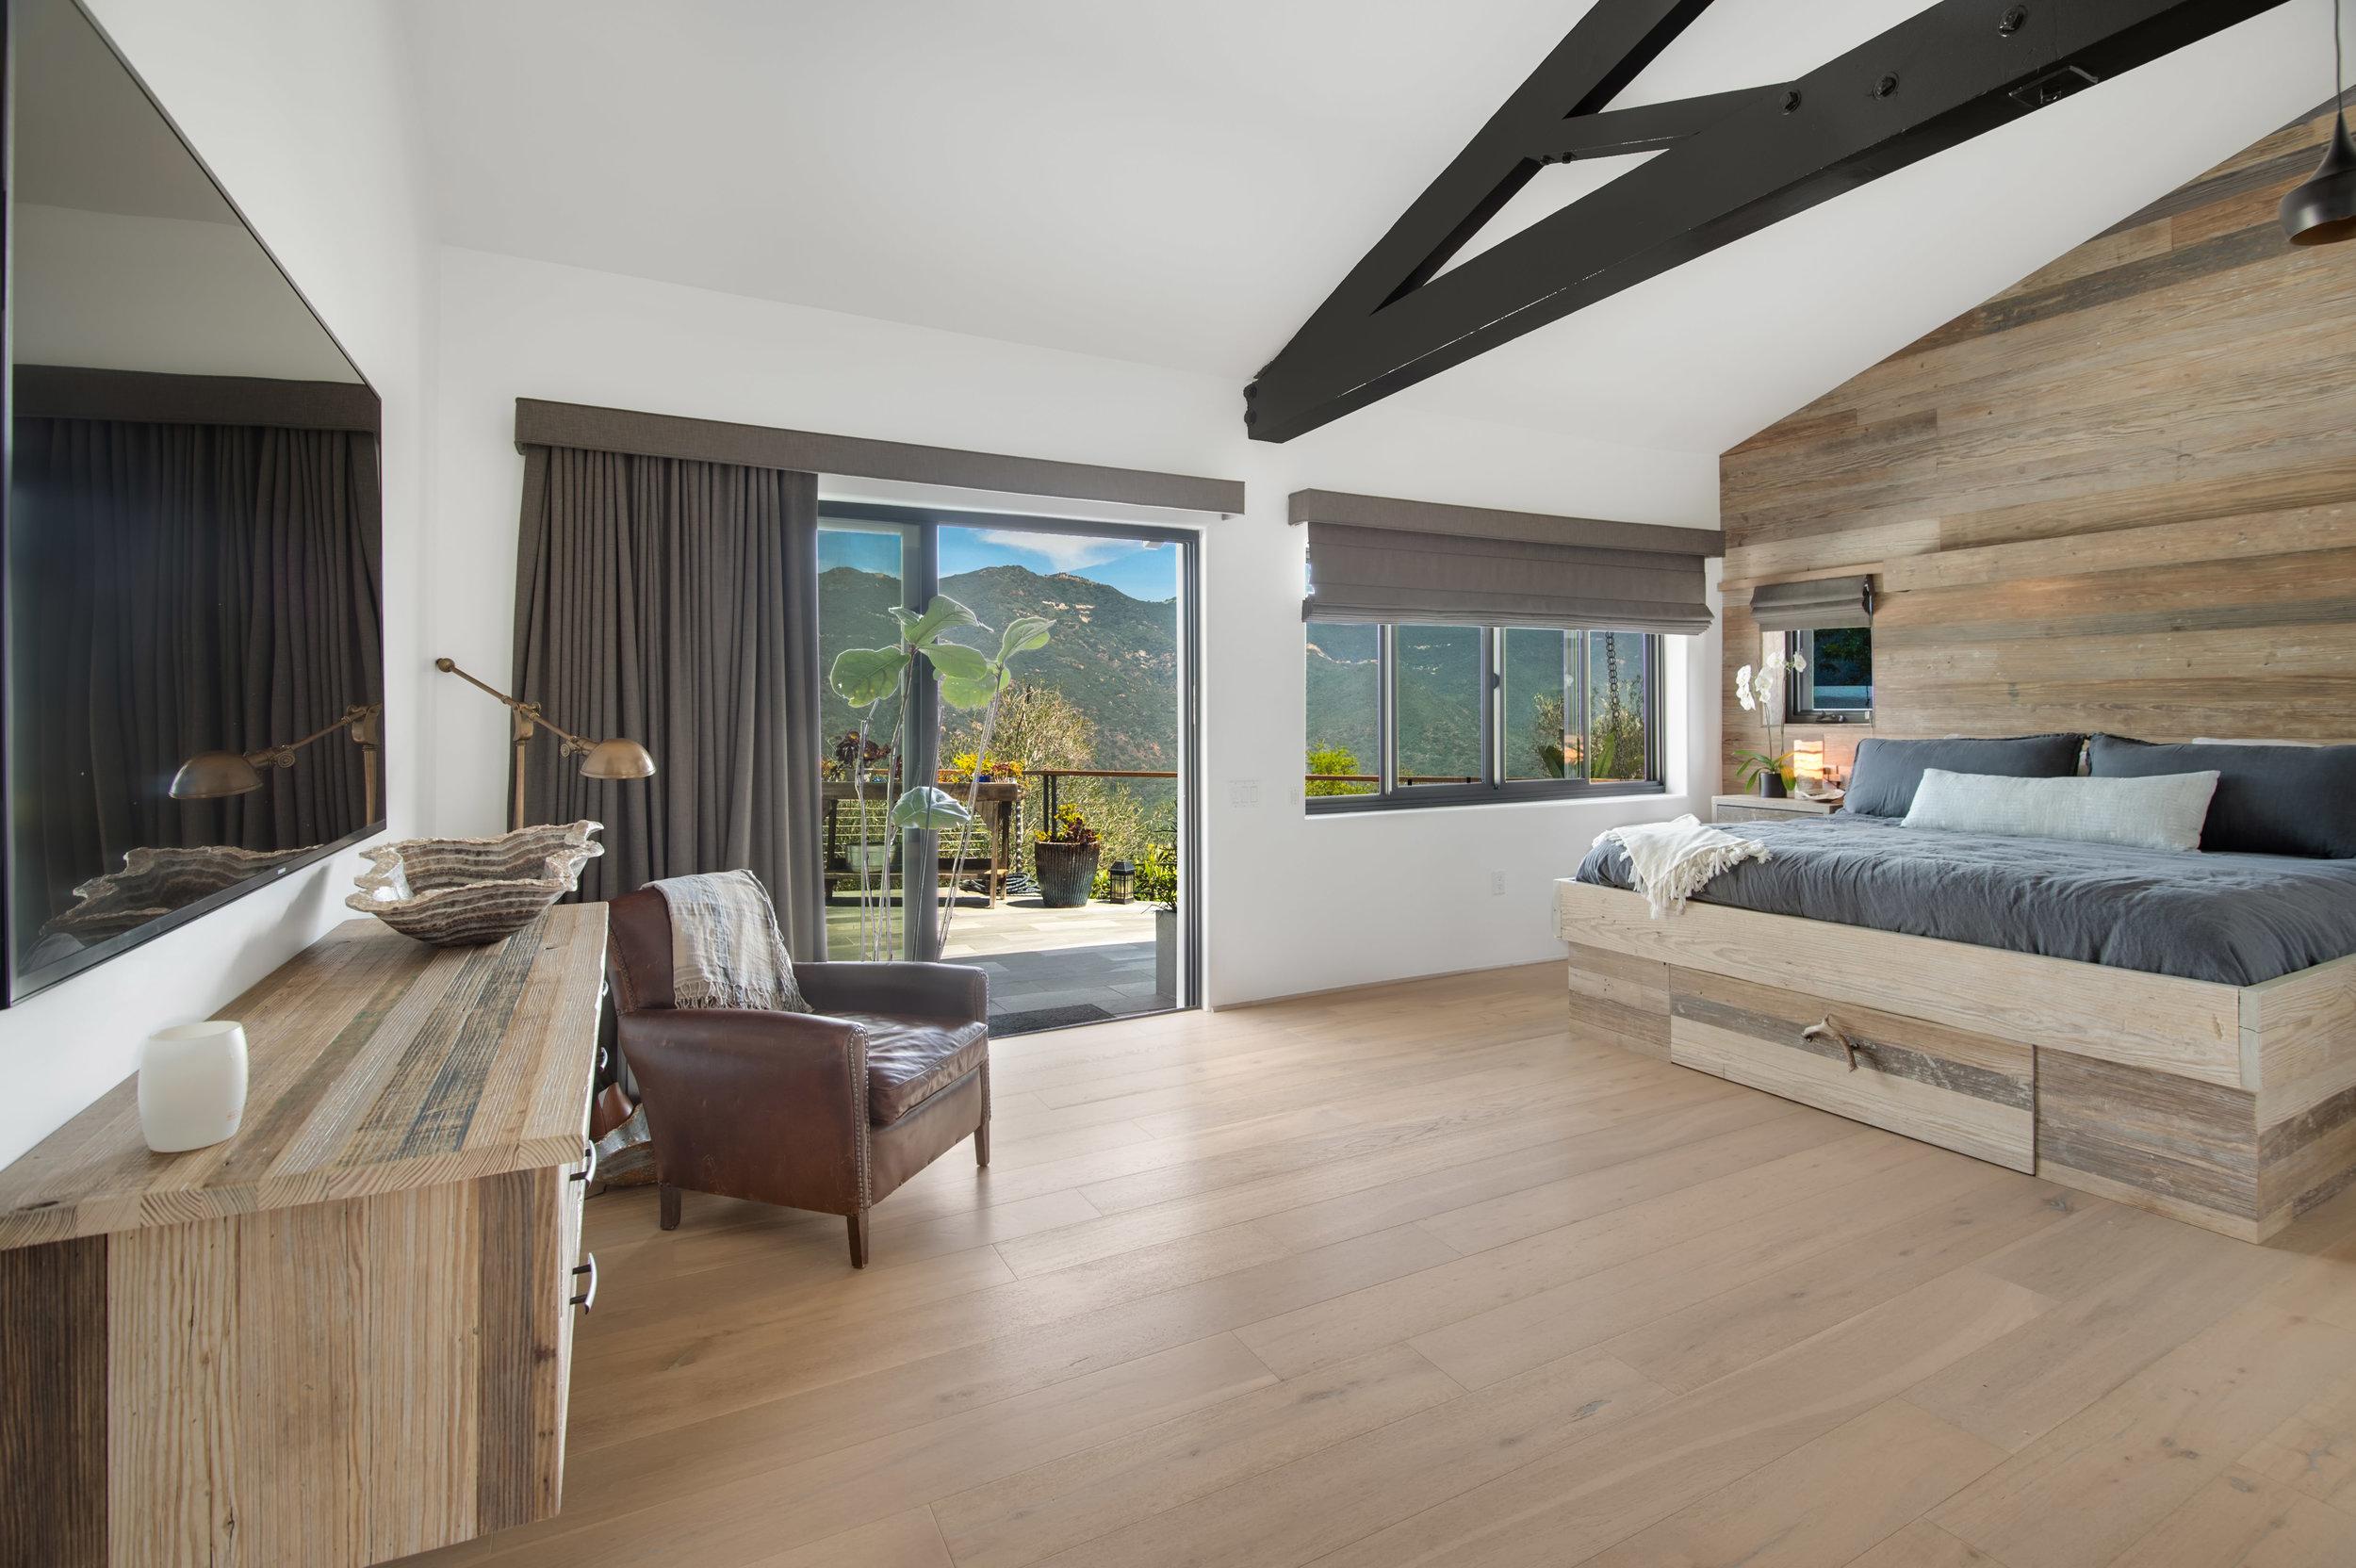 018 Master Bedroom 26272 Cool Glen Way Malibu For Sale Luxury Real Estate.jpg